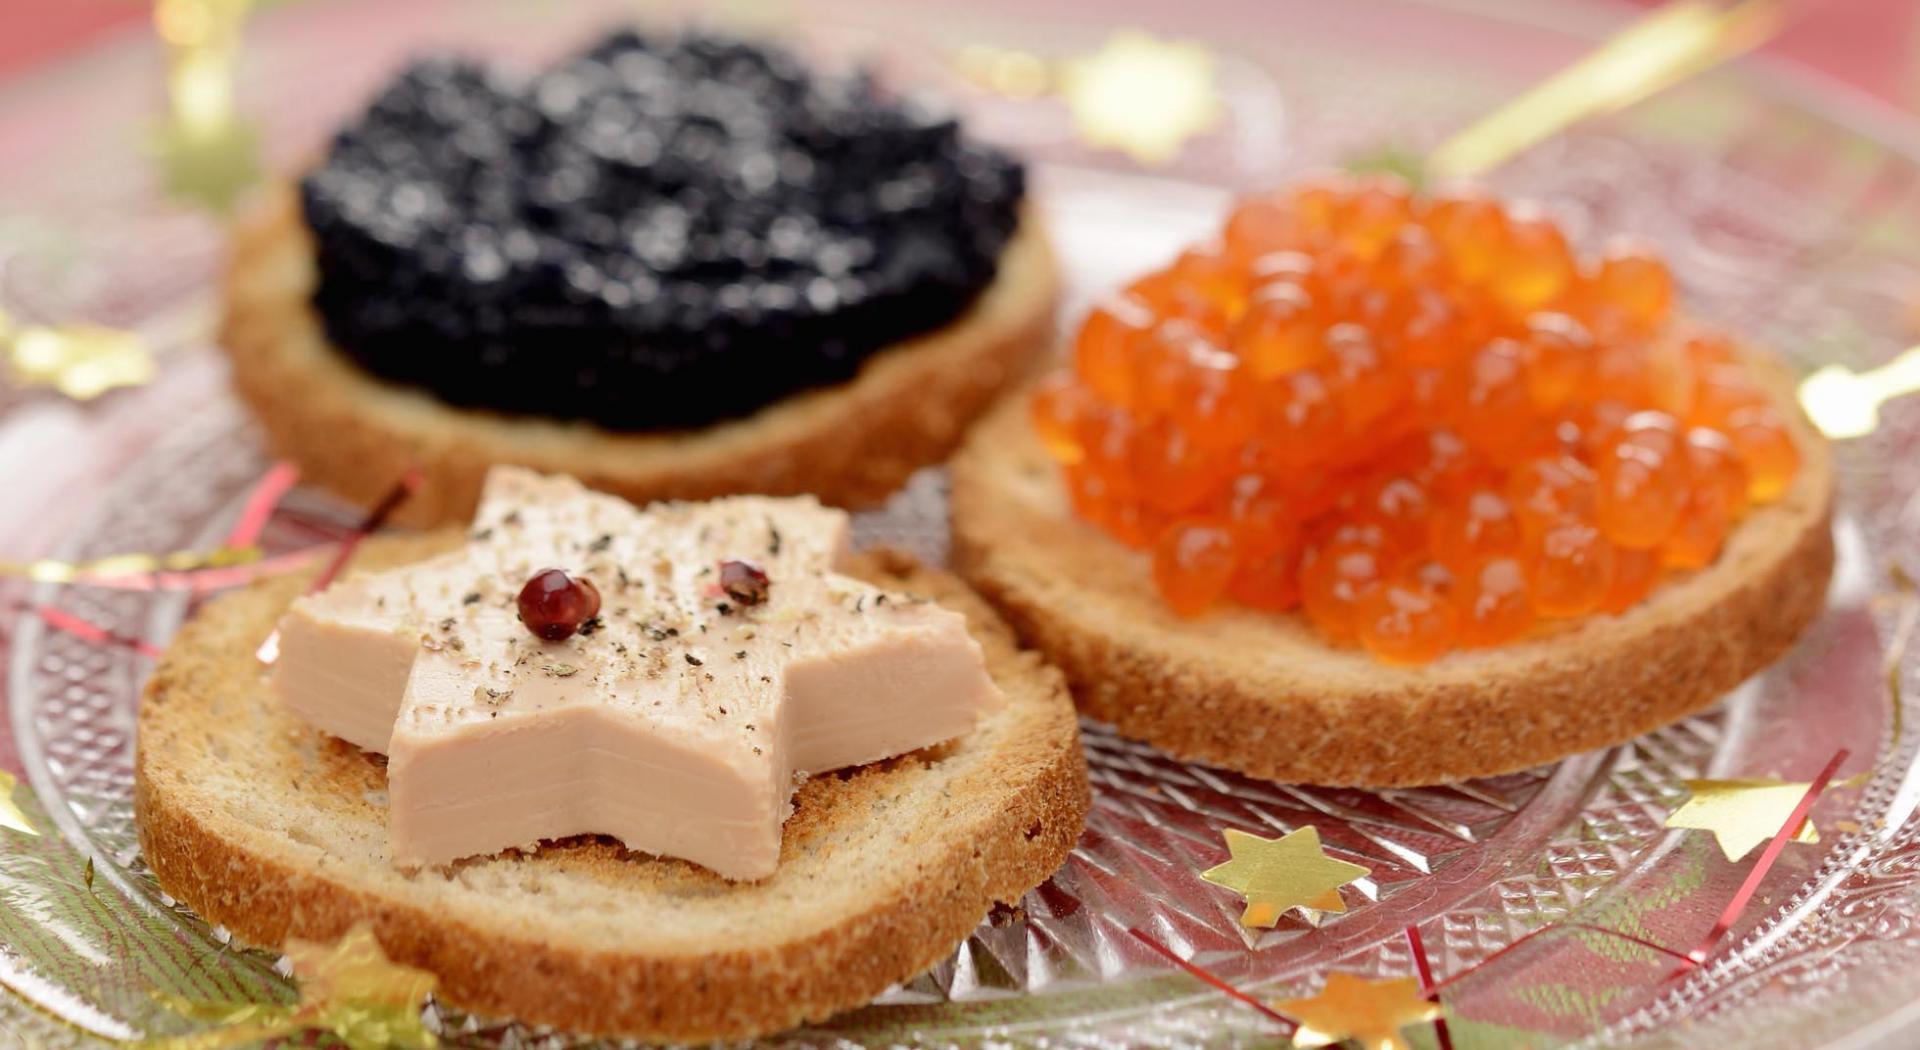 Antipasti Di Natale Toscani.Antipasti Di Natale Tutte Le Ricette Aia Food